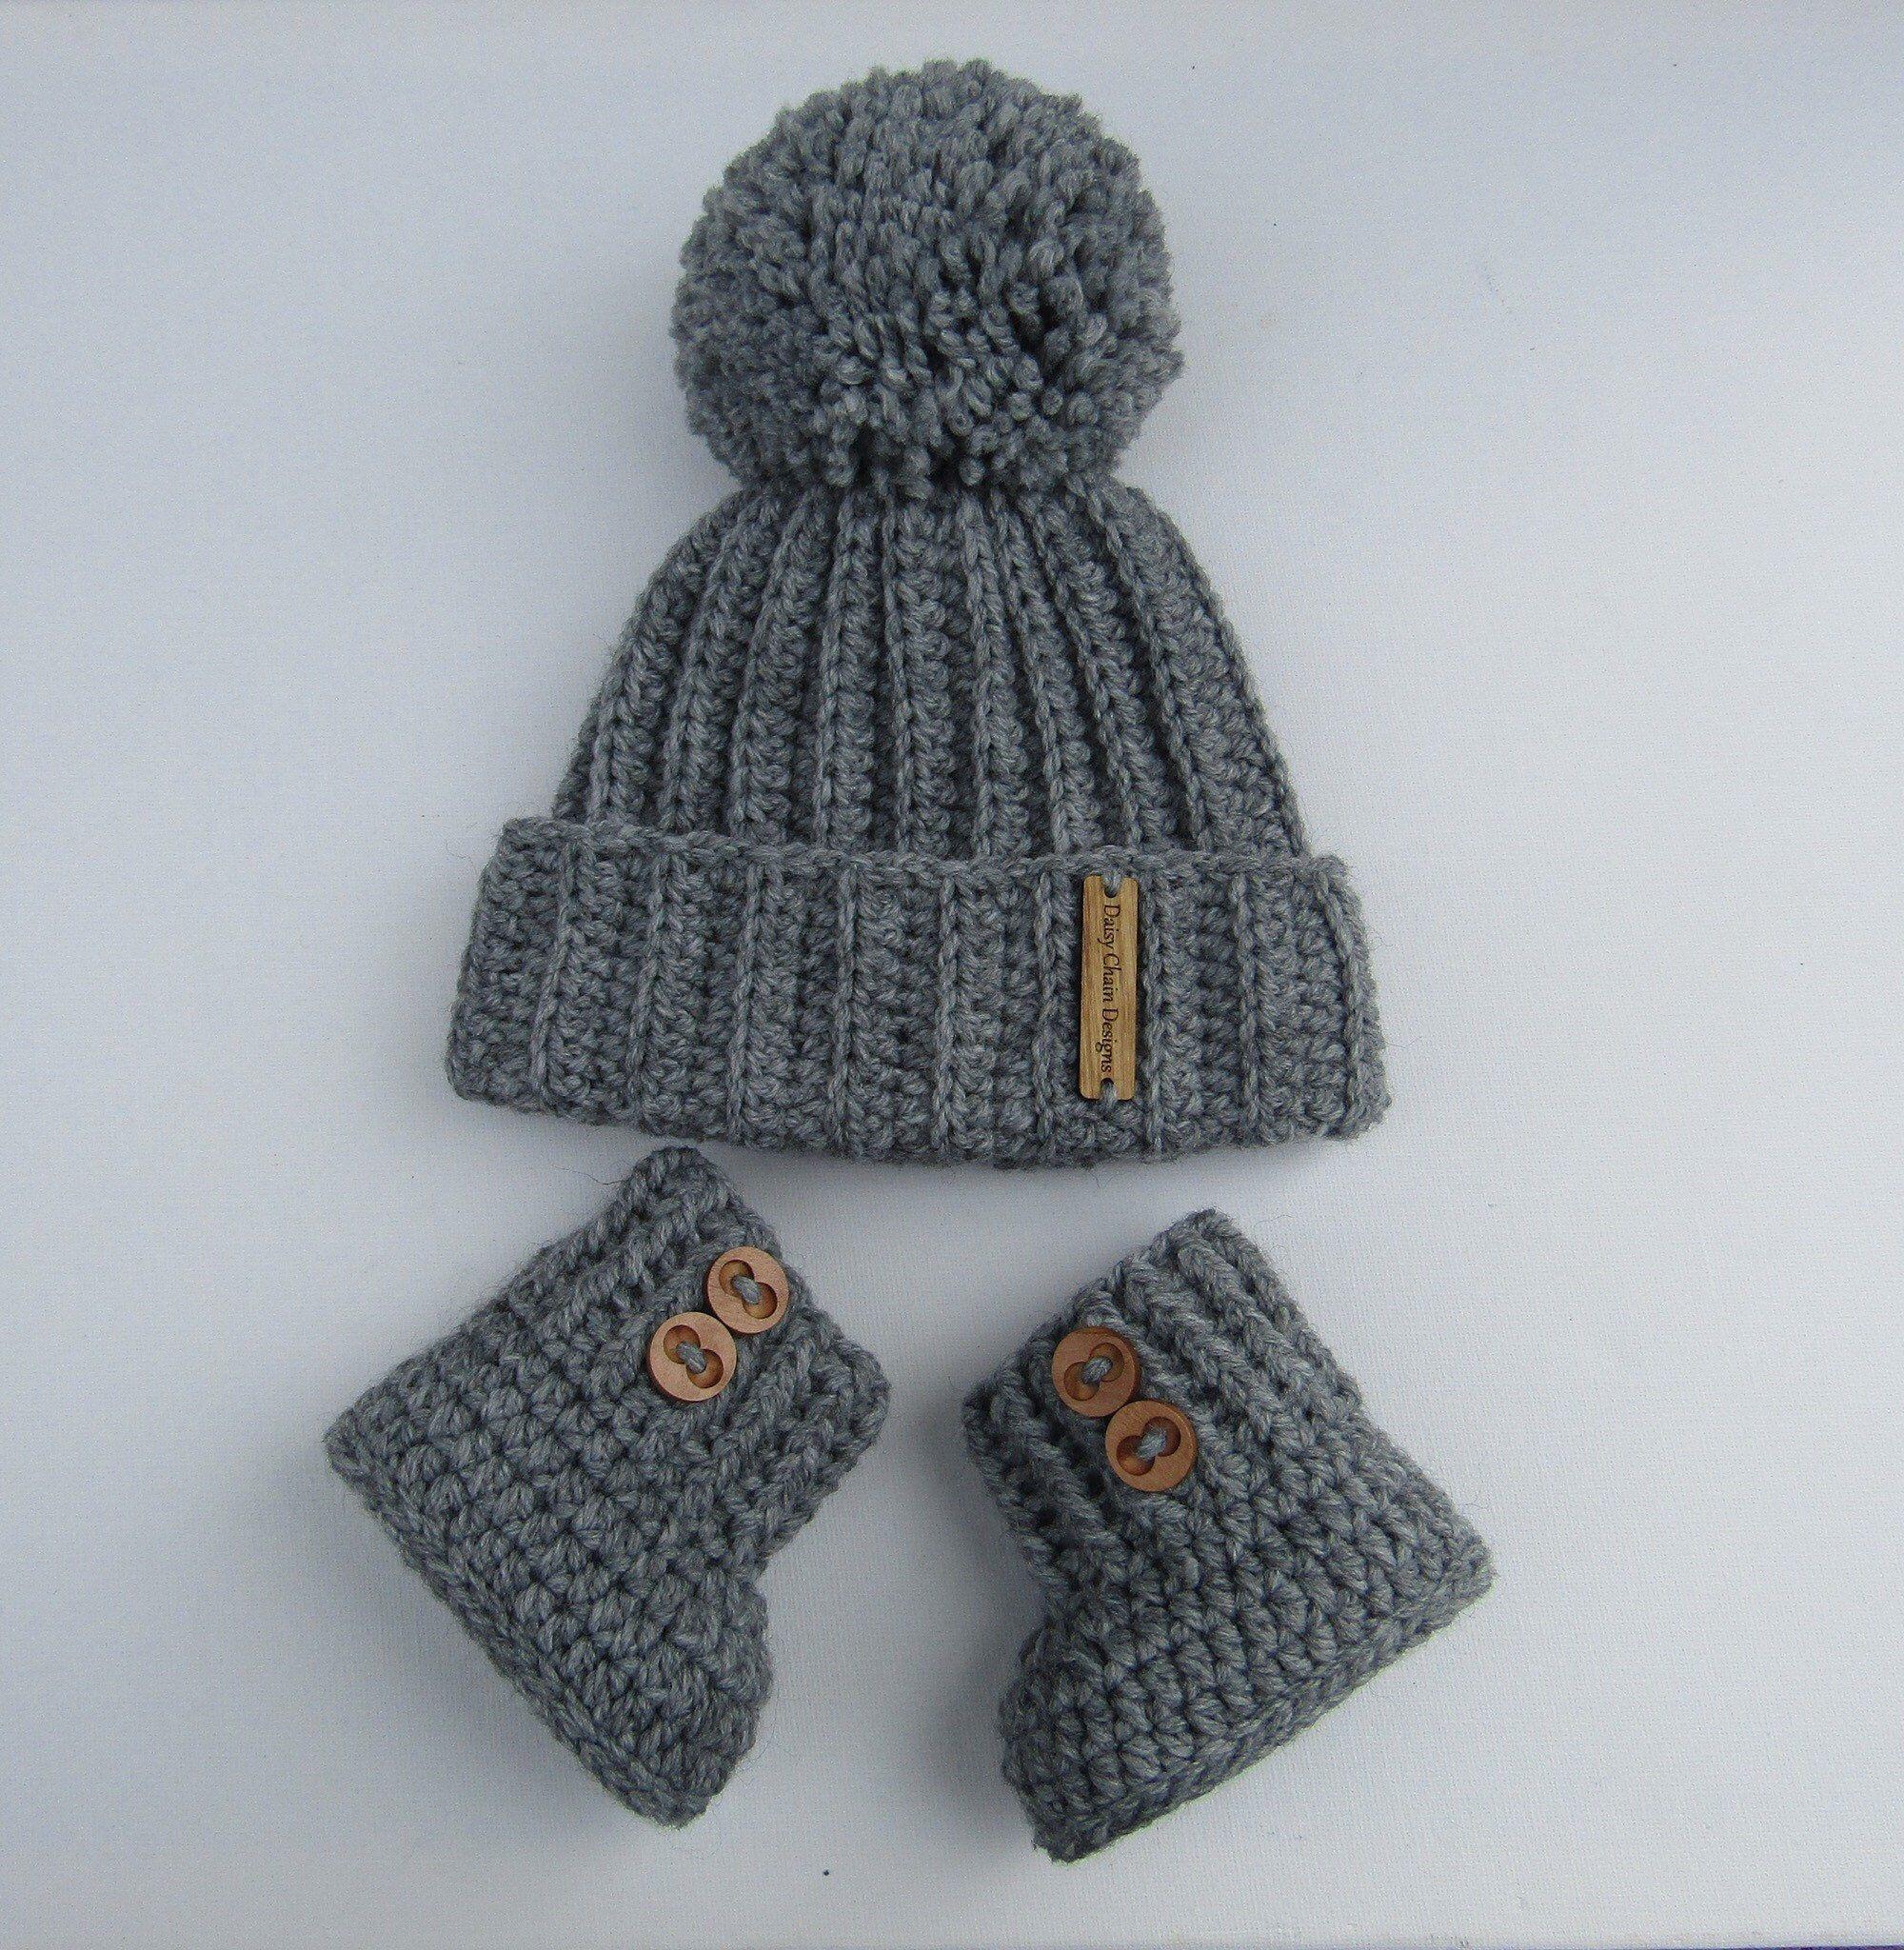 Photo of Items similar to Baby booties, crochetbooties, crochet shoes, crochet boot and hat set, baby boy gift, newborn gift, uk handmade on Etsy